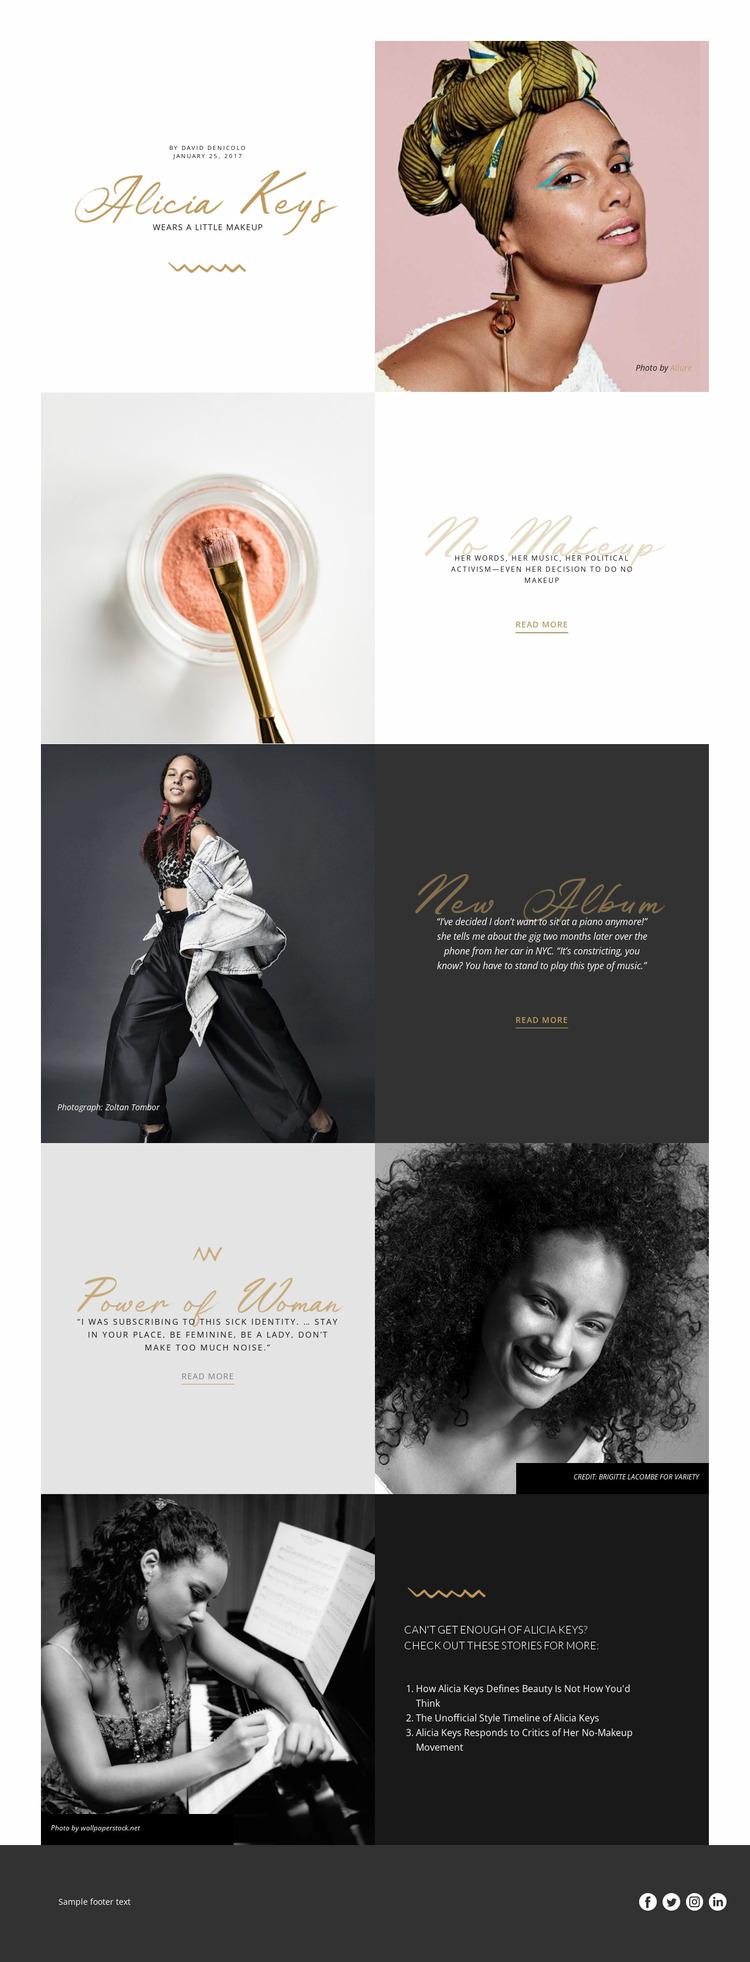 Alicia Keys WordPress Website Builder